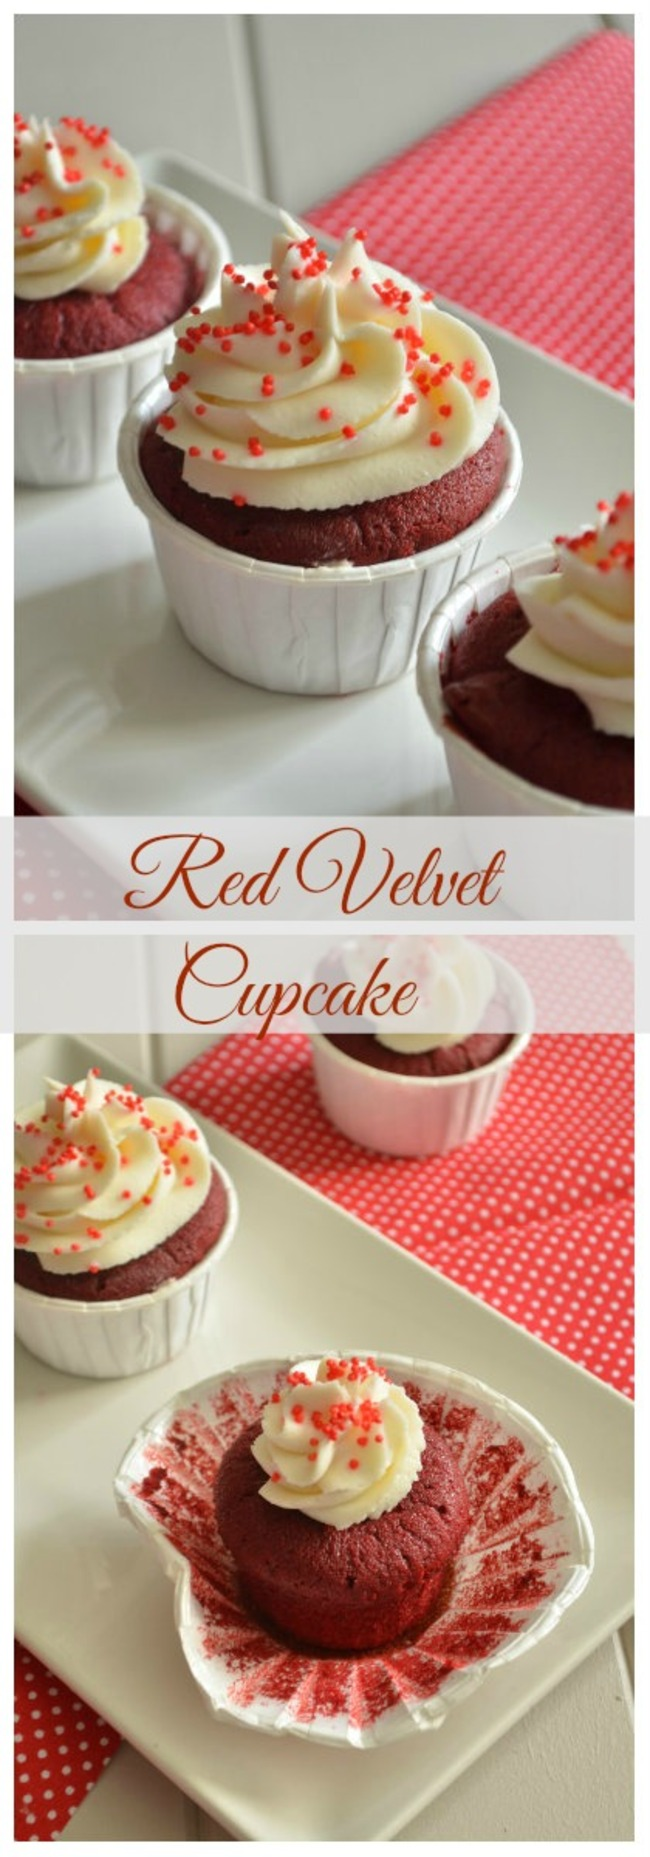 Red Velvet Cupcake {Le Cupcake rouge velour}